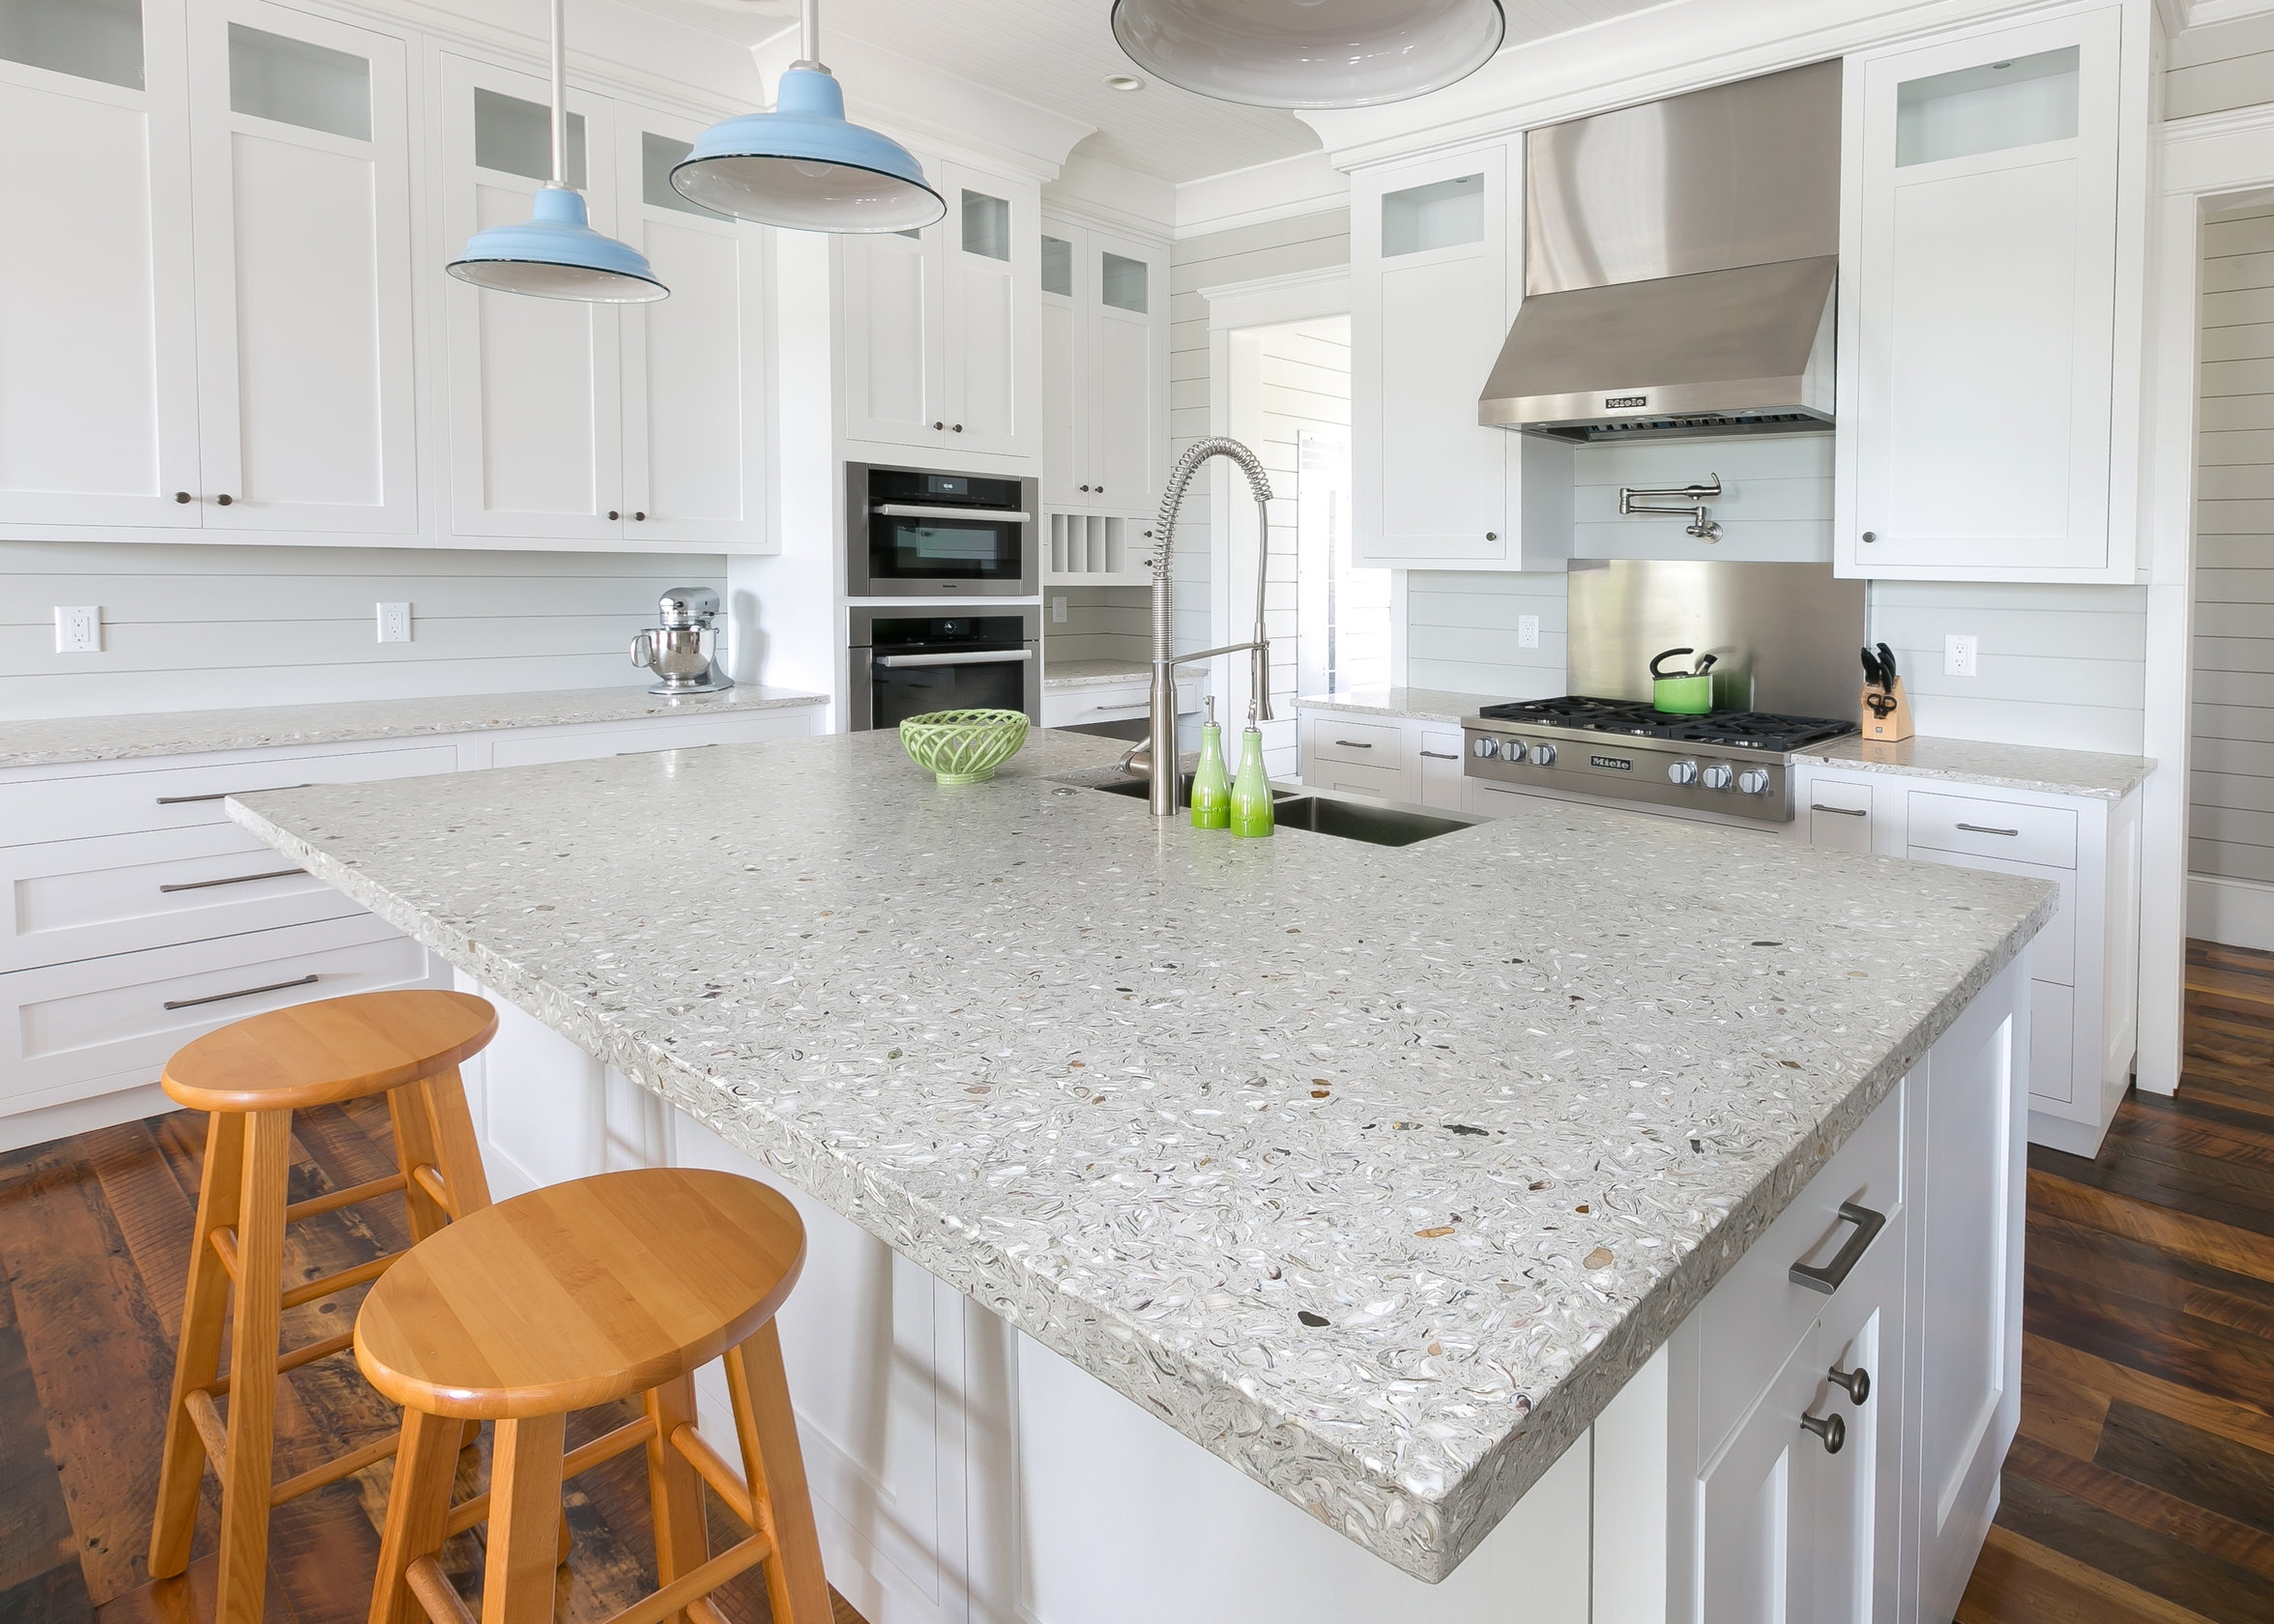 Elegant and ecofriendly custom countertops Charleston, SC